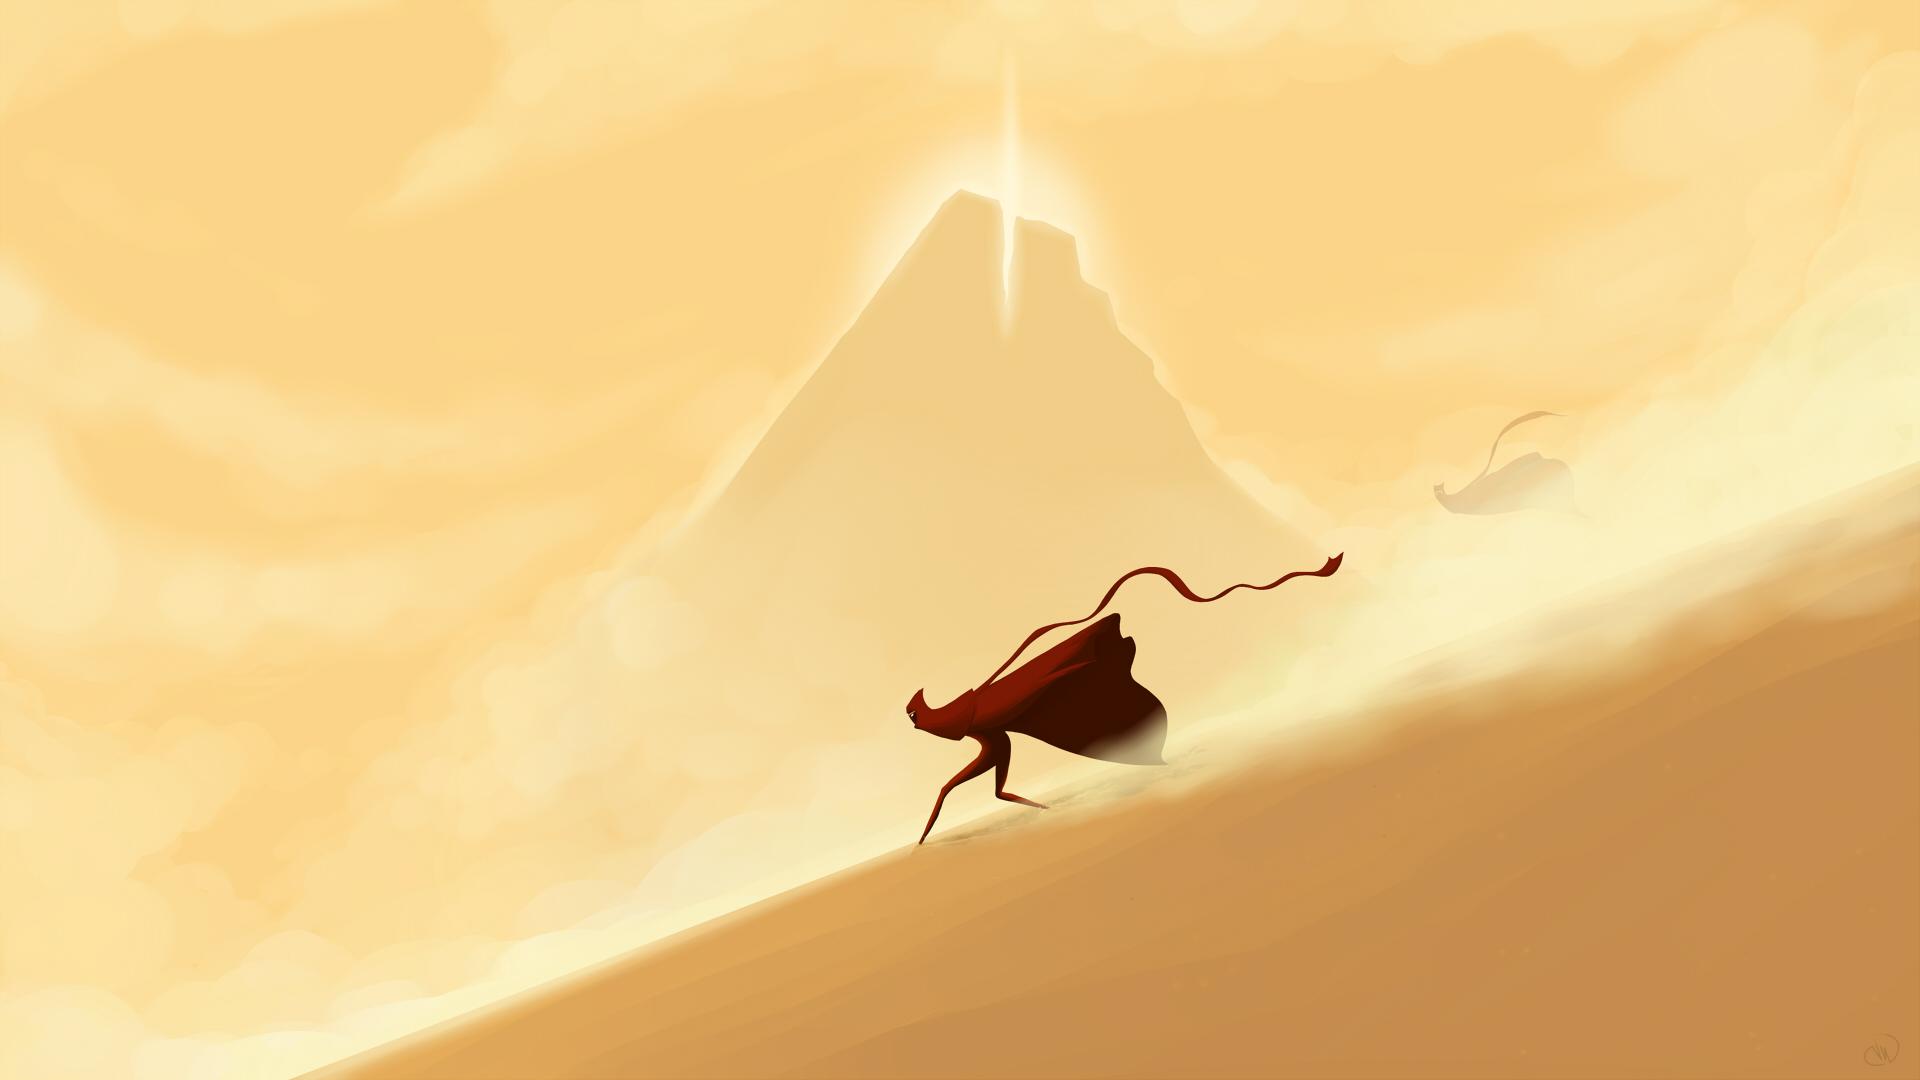 https://i0.wp.com/stickskills.com/wp-content/uploads/2013/02/Journey-PS3-game.jpg